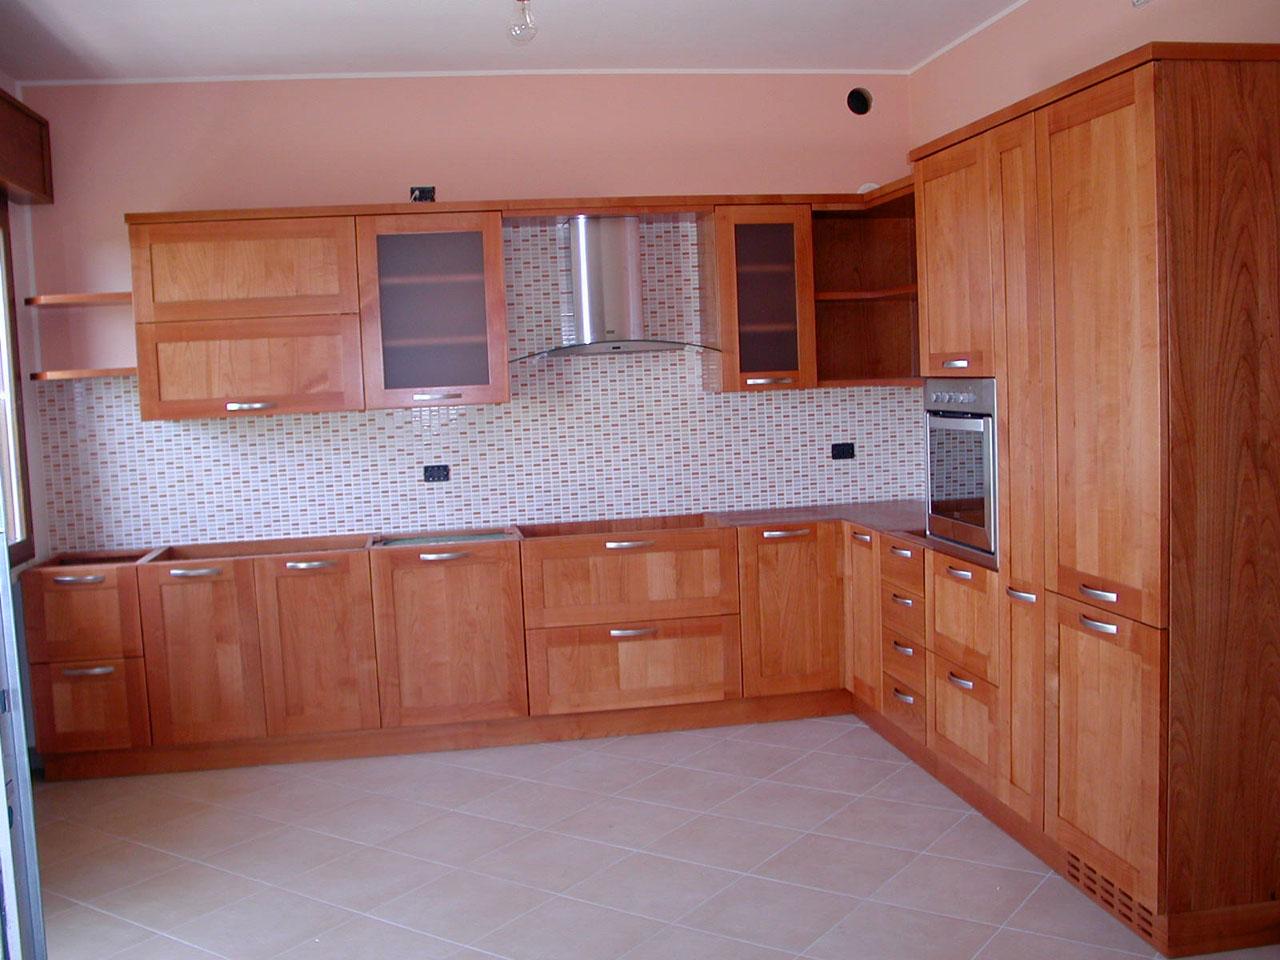 immagine. illuminazione sottopensile cucina. cucina nobilia cucina ...